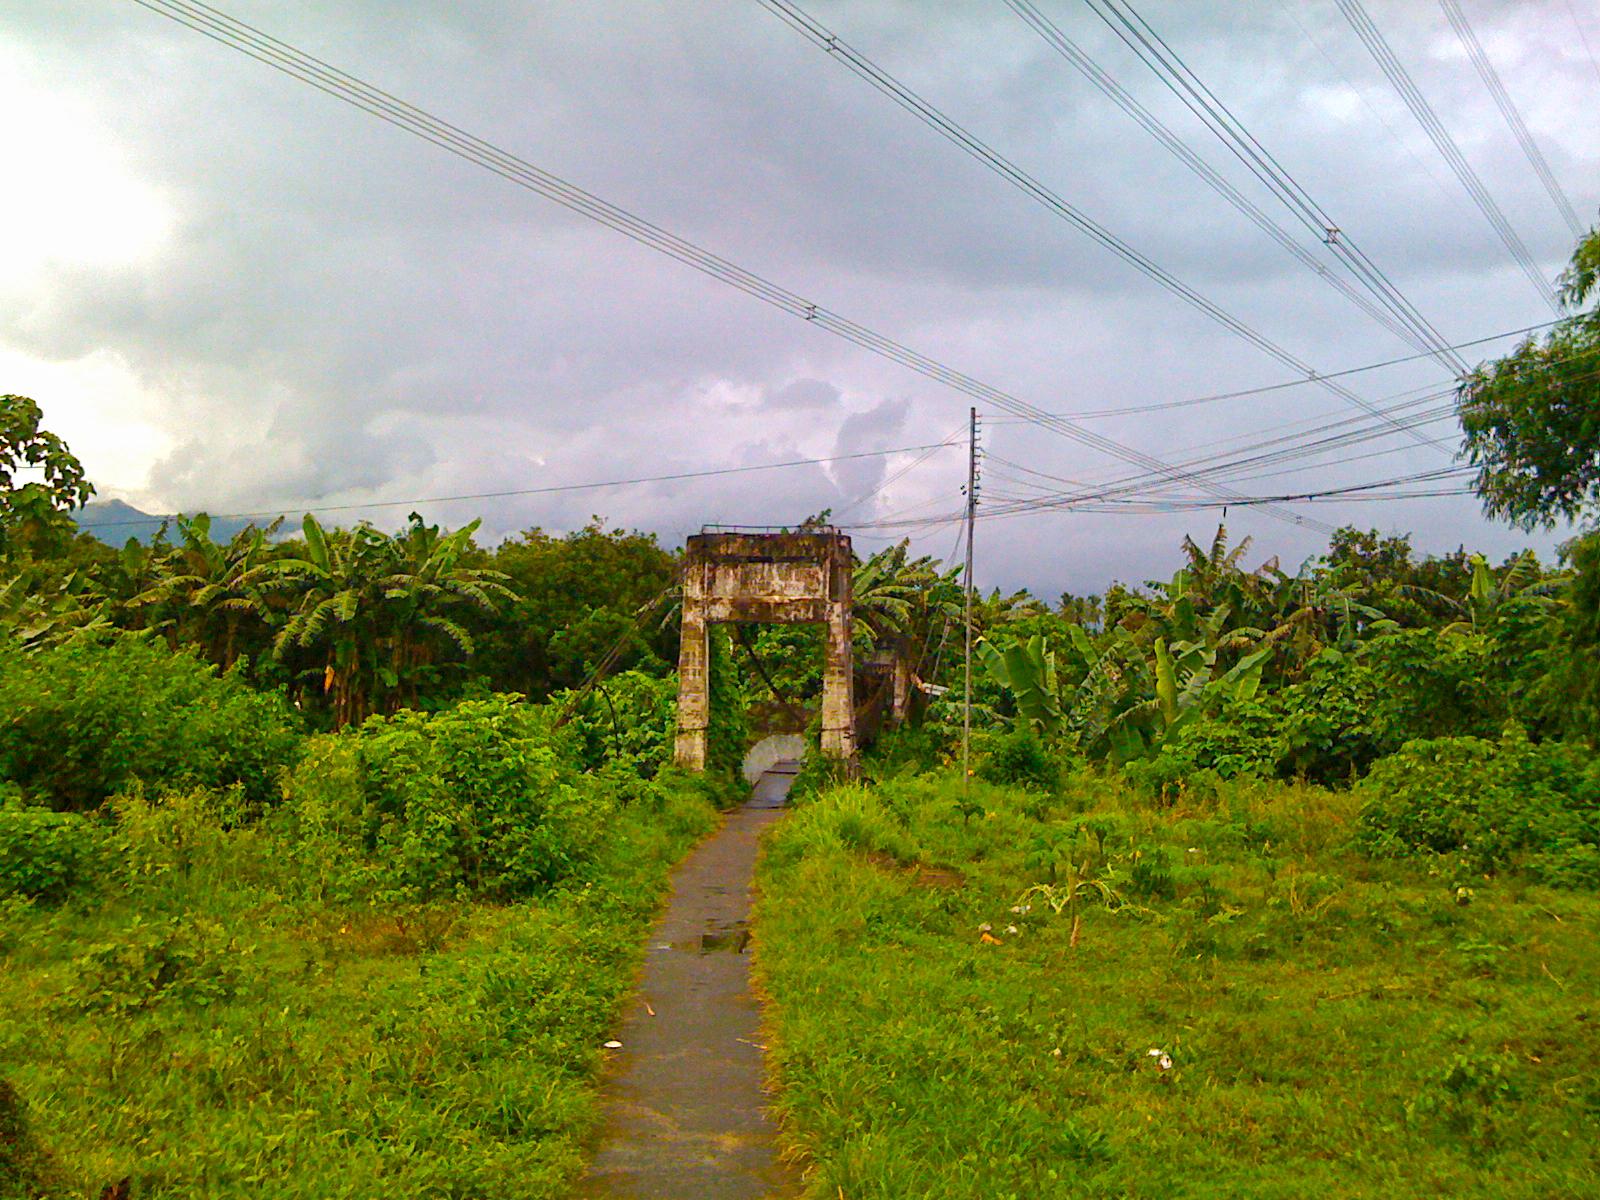 Tiaong, Laguna, Phillippines